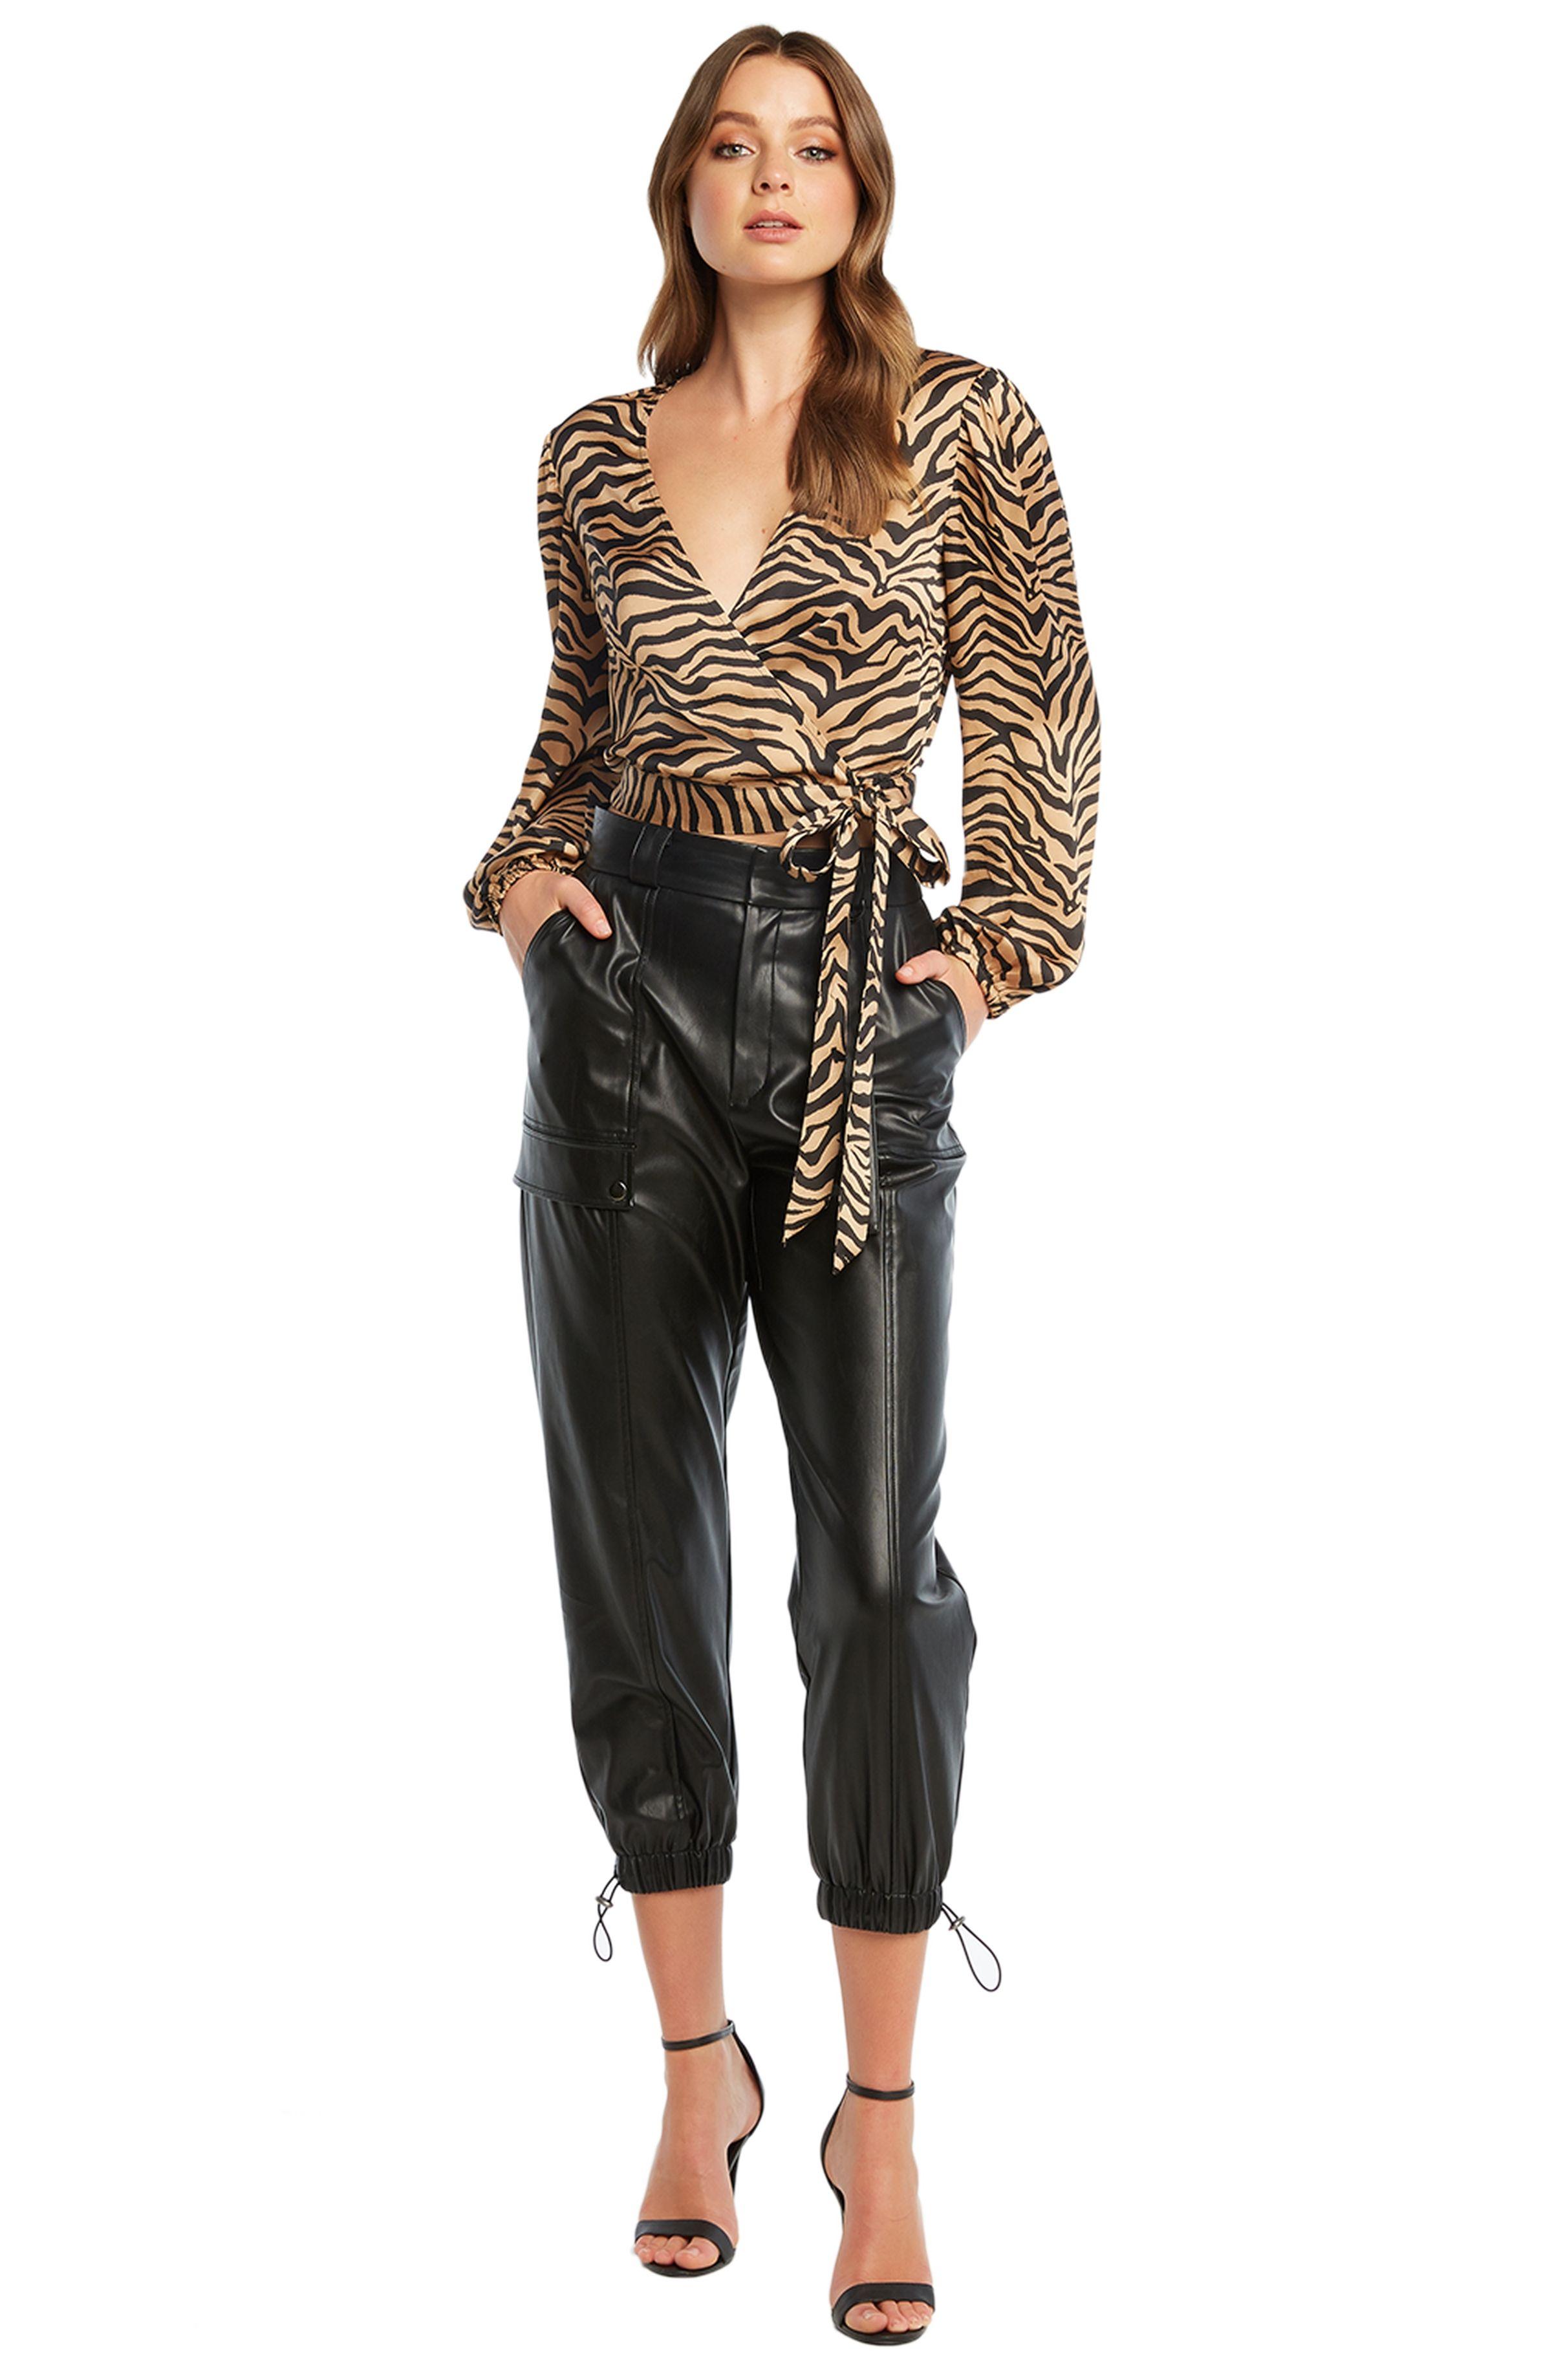 Women S Pu Riley Leather Cargo Pants Womens Black Dress Pants Casual Dress Pants Black Trousers Casual [ 3680 x 2400 Pixel ]